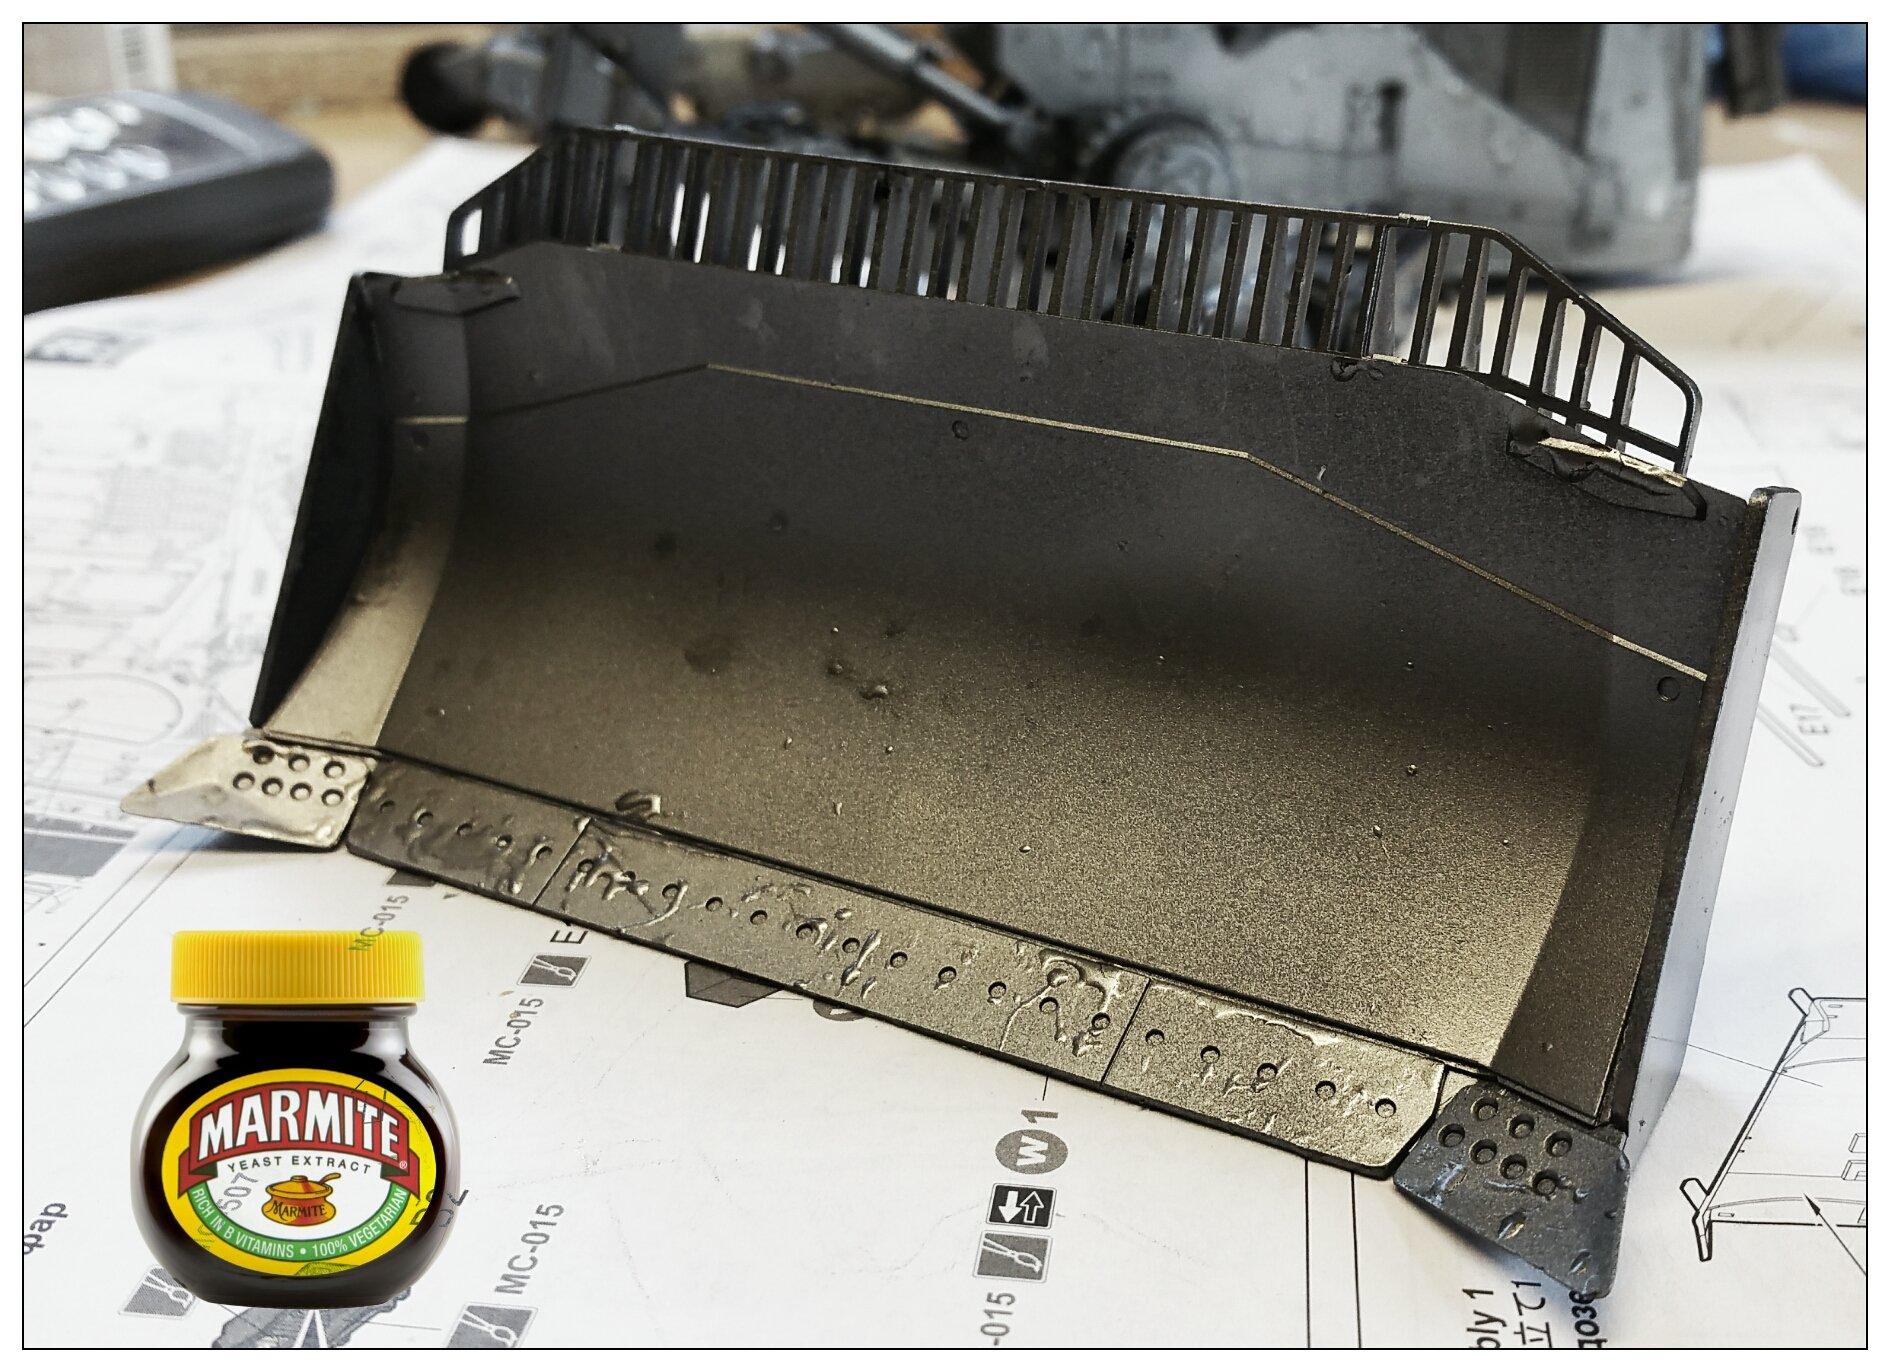 Marmite Chipping Process BARTSHARP Airbrush